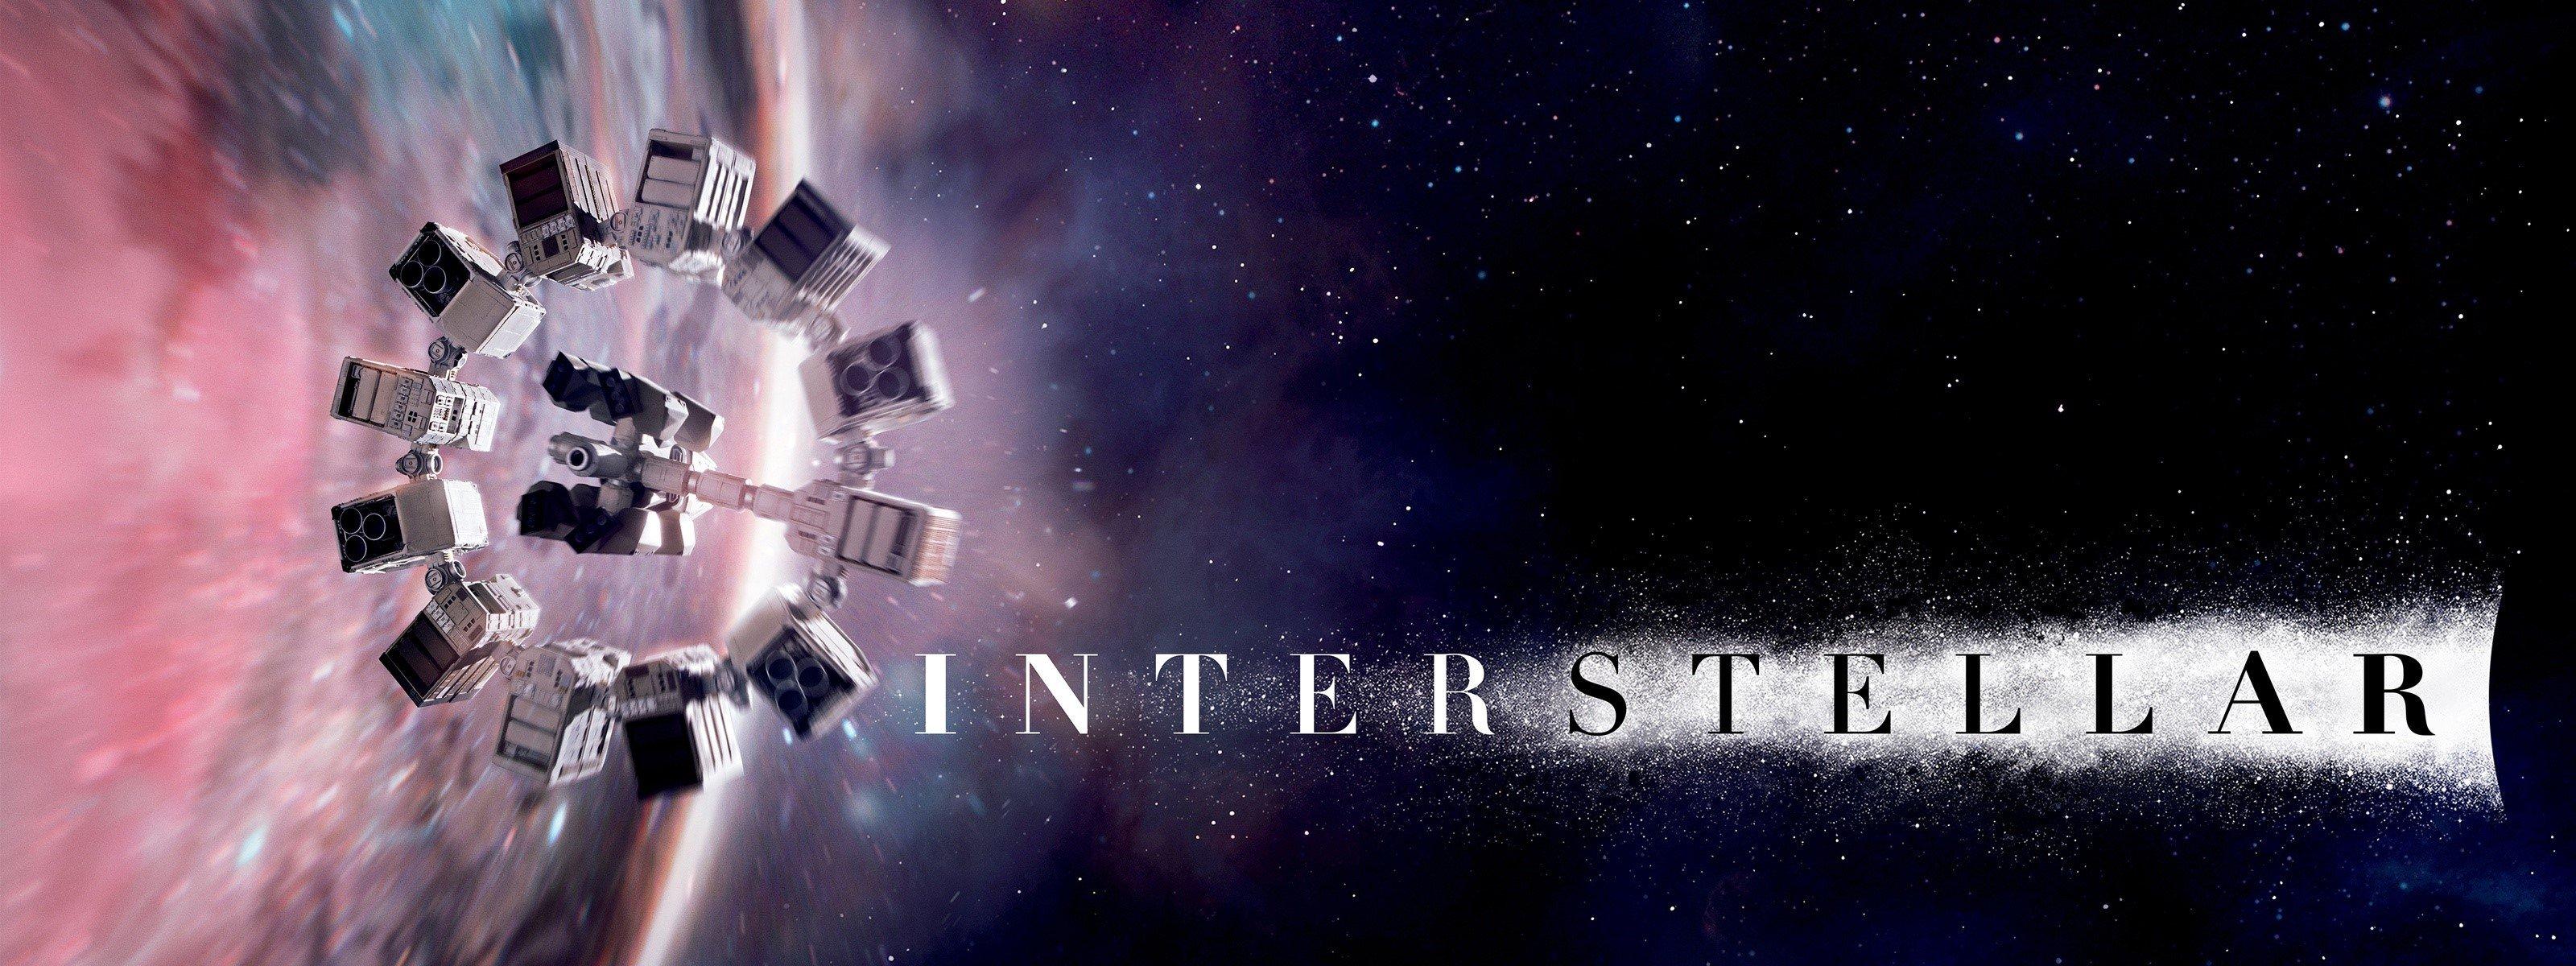 Wallpaper Interstellar movie